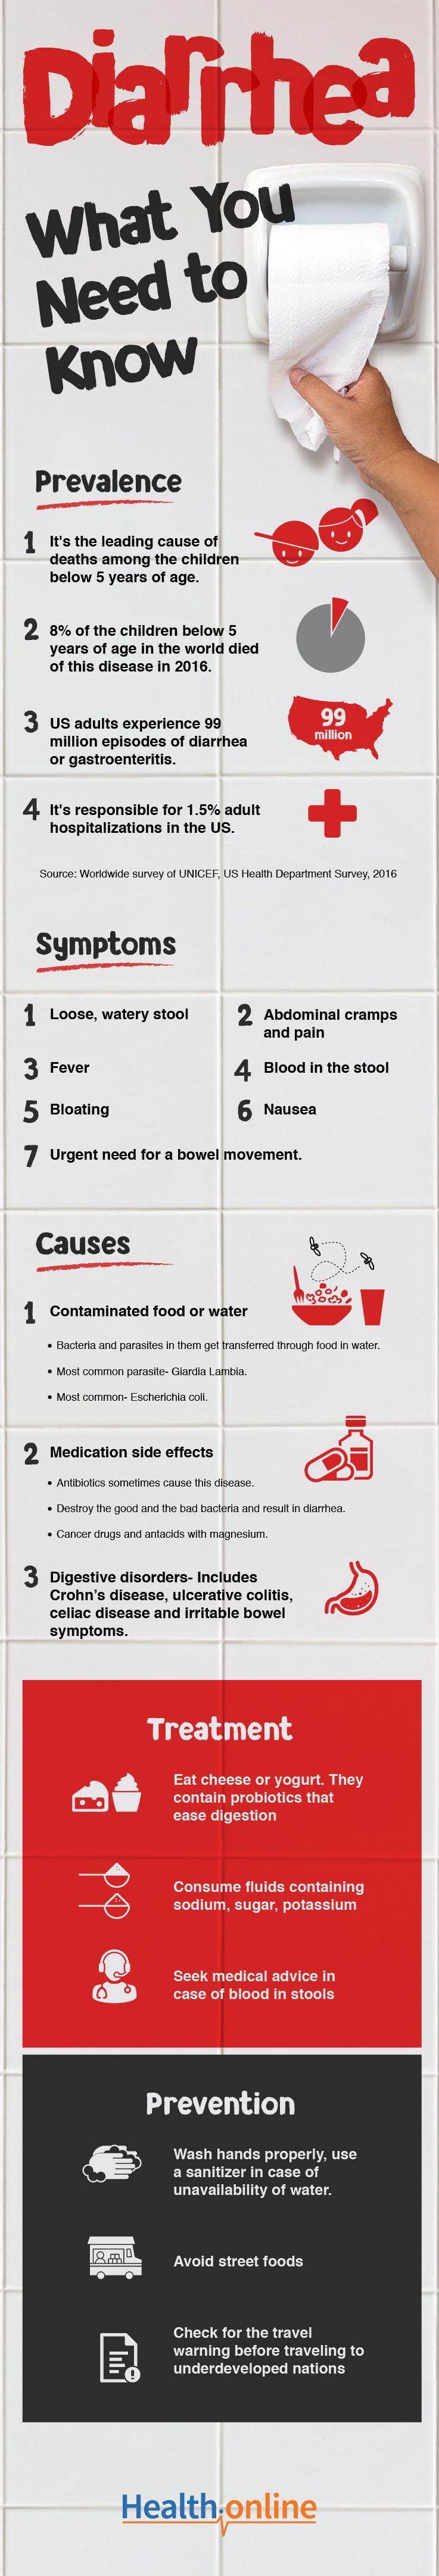 What Is Diarrhea | Medical conditions, Disease, Diarrhea